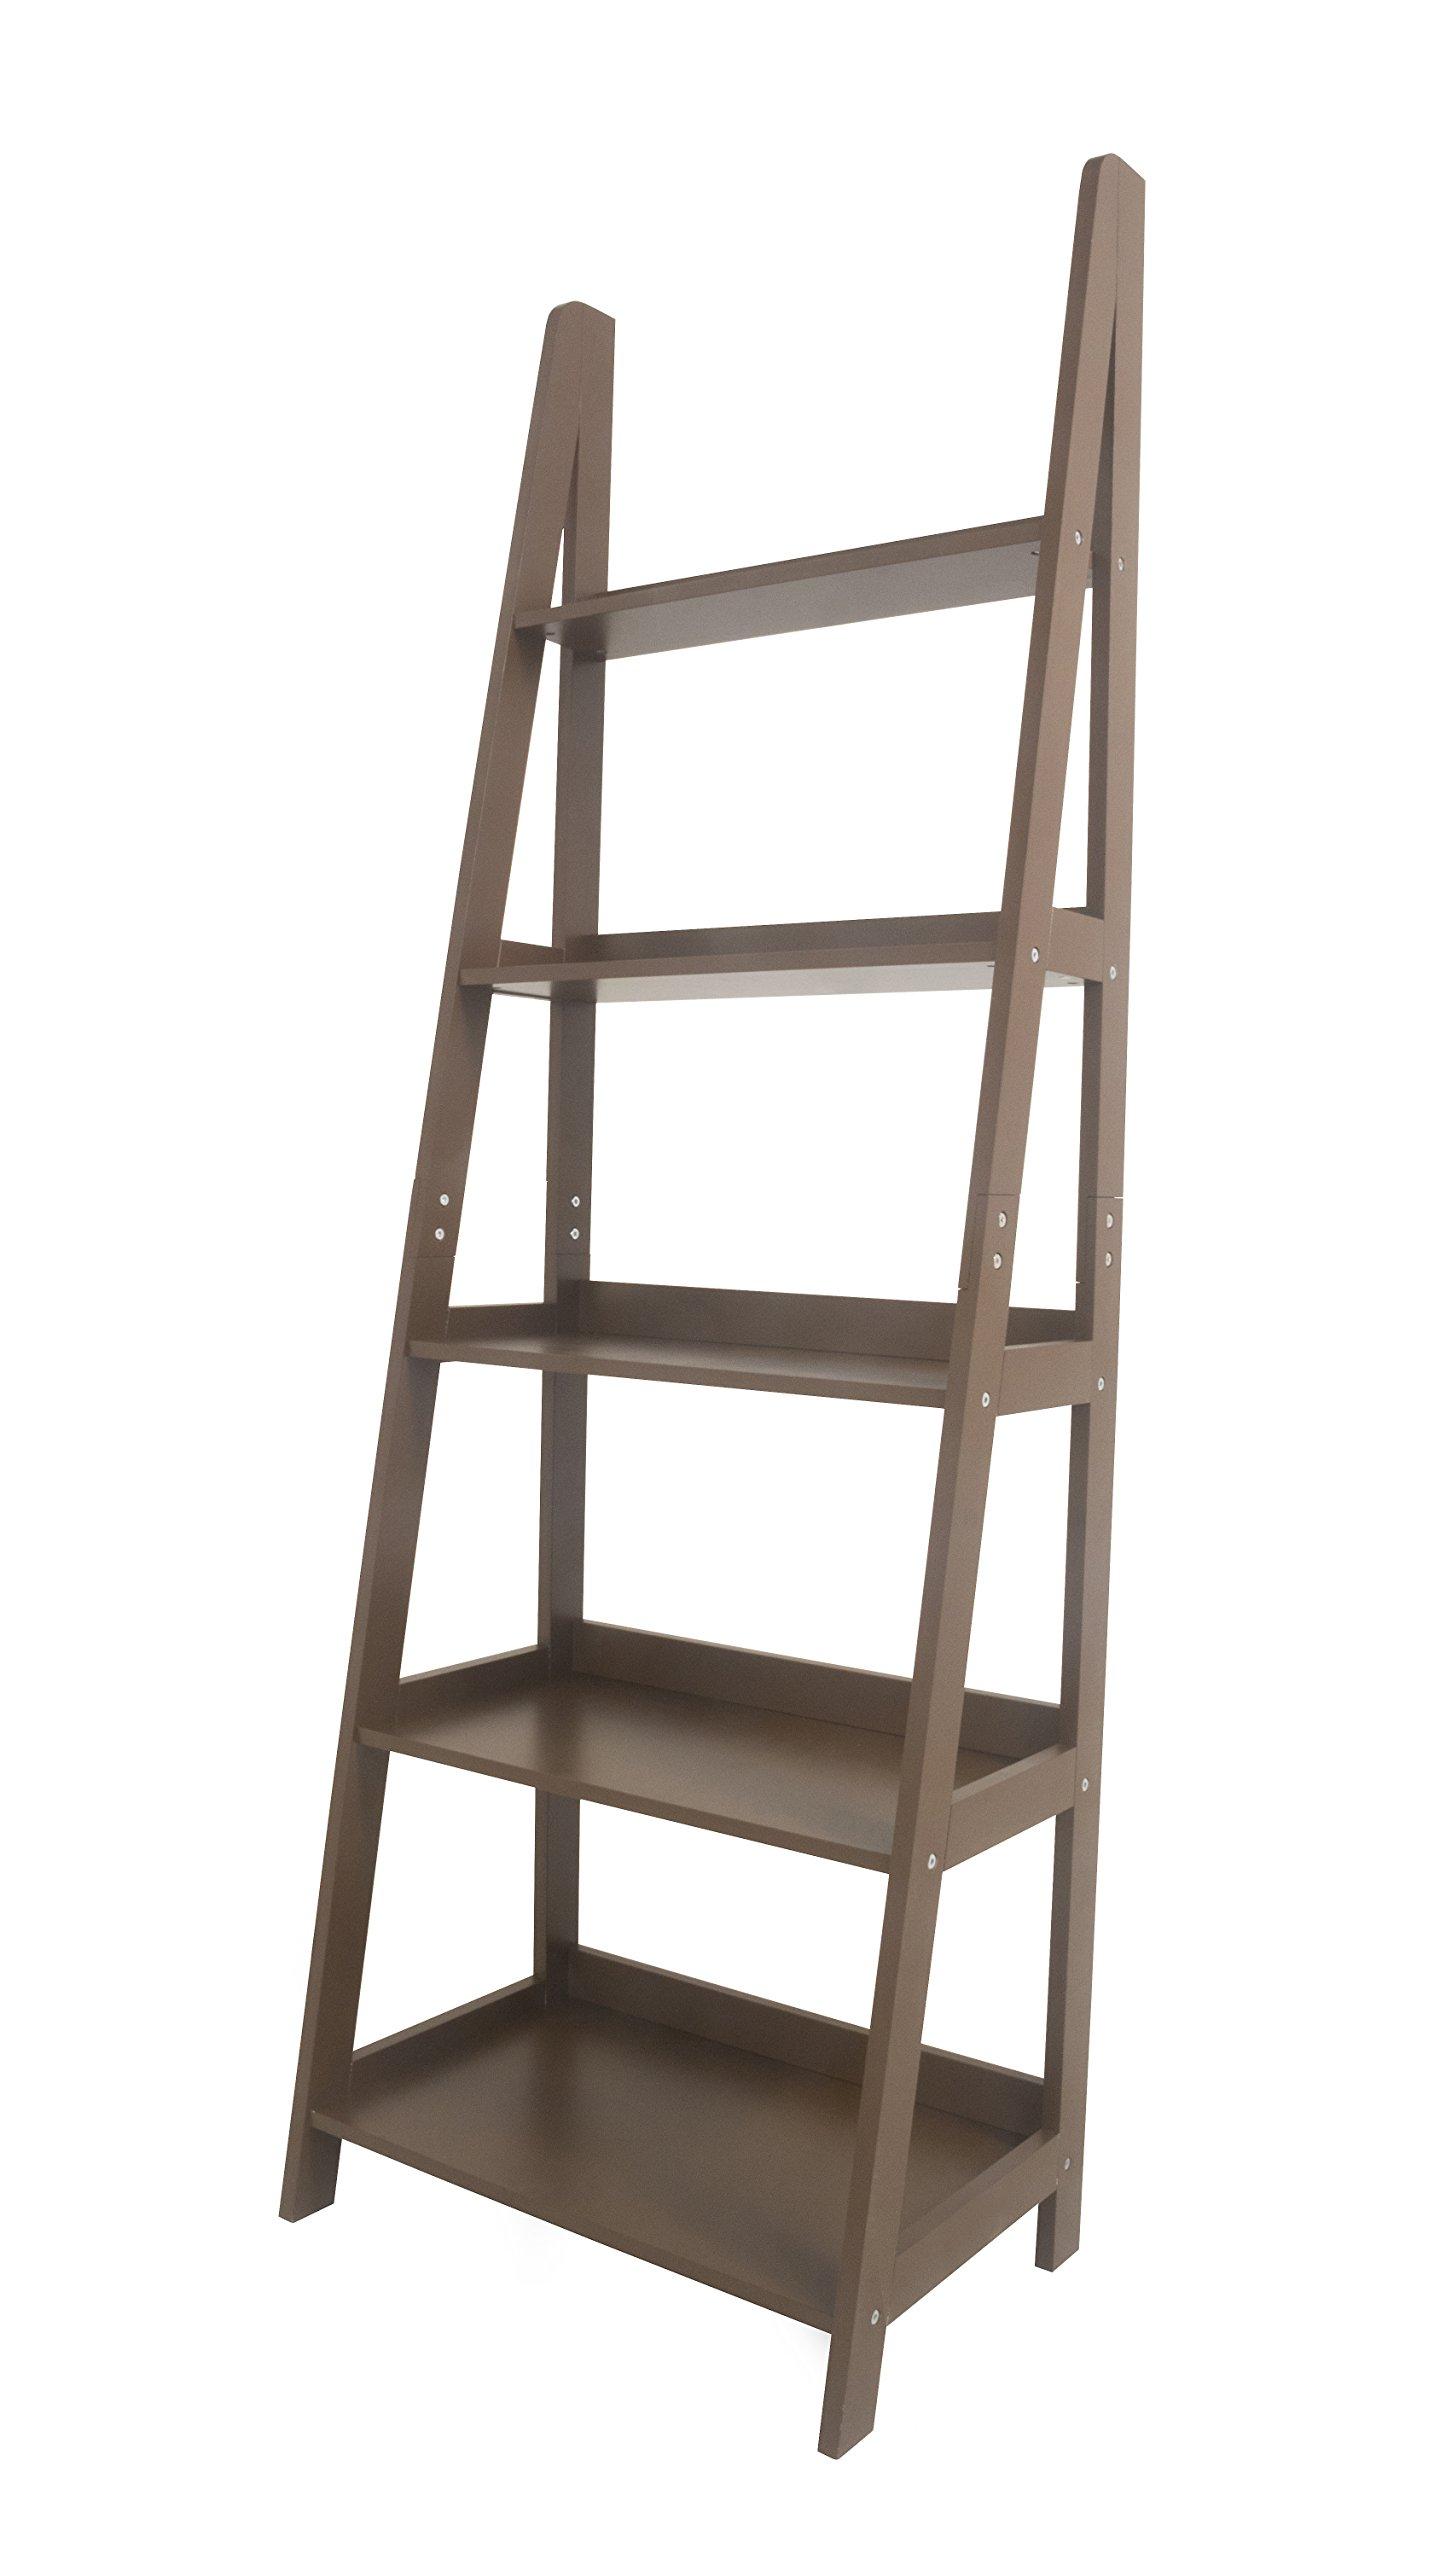 Geneva 5 tier Innovex ladder leaning bookcase, multifunctional wood storage display wall shelve, brown